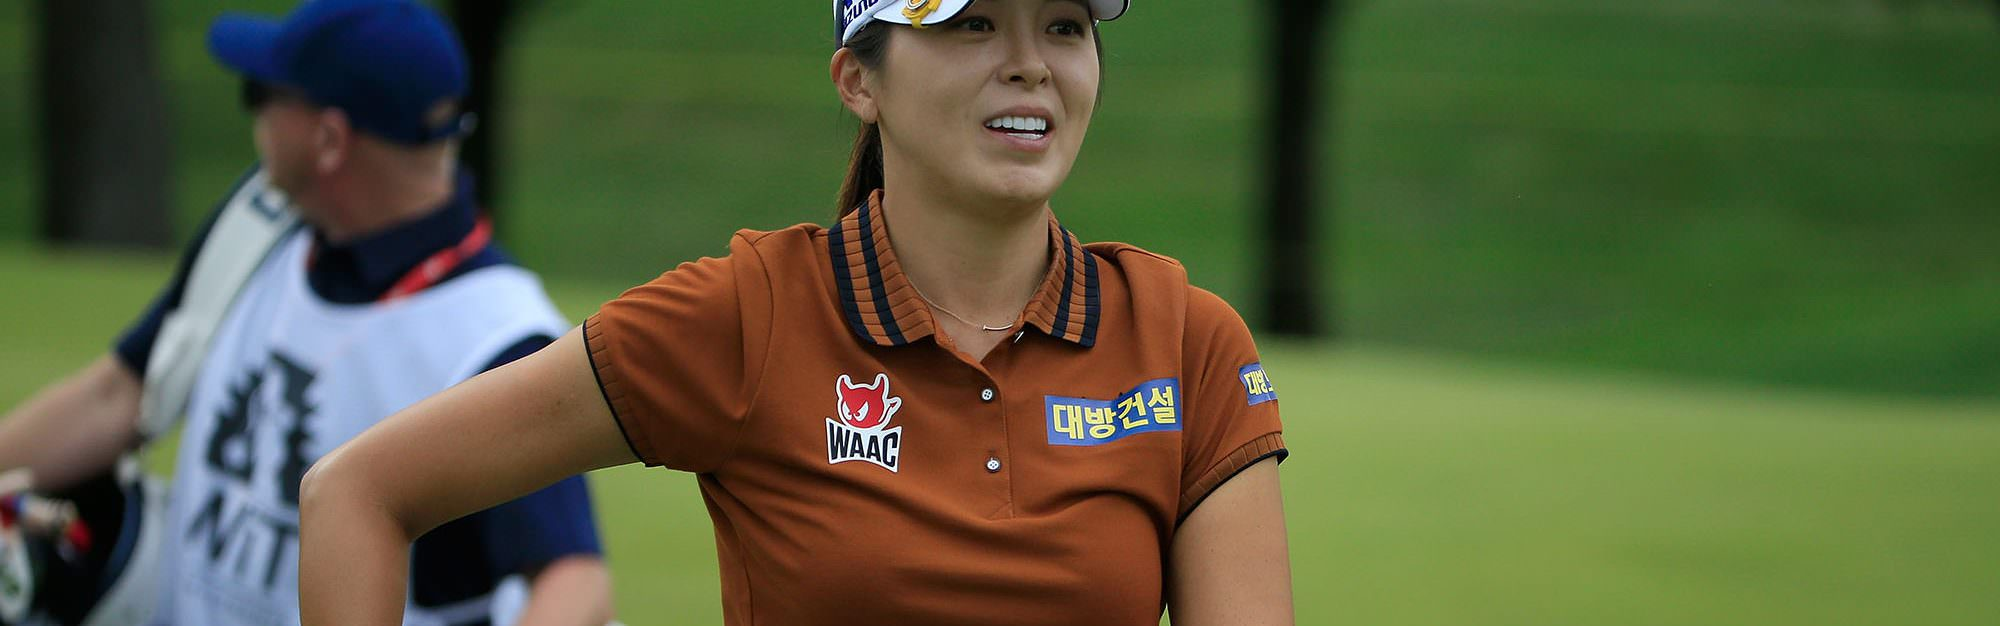 It's Hur time again: Mi Jung claims fourth LPGA title